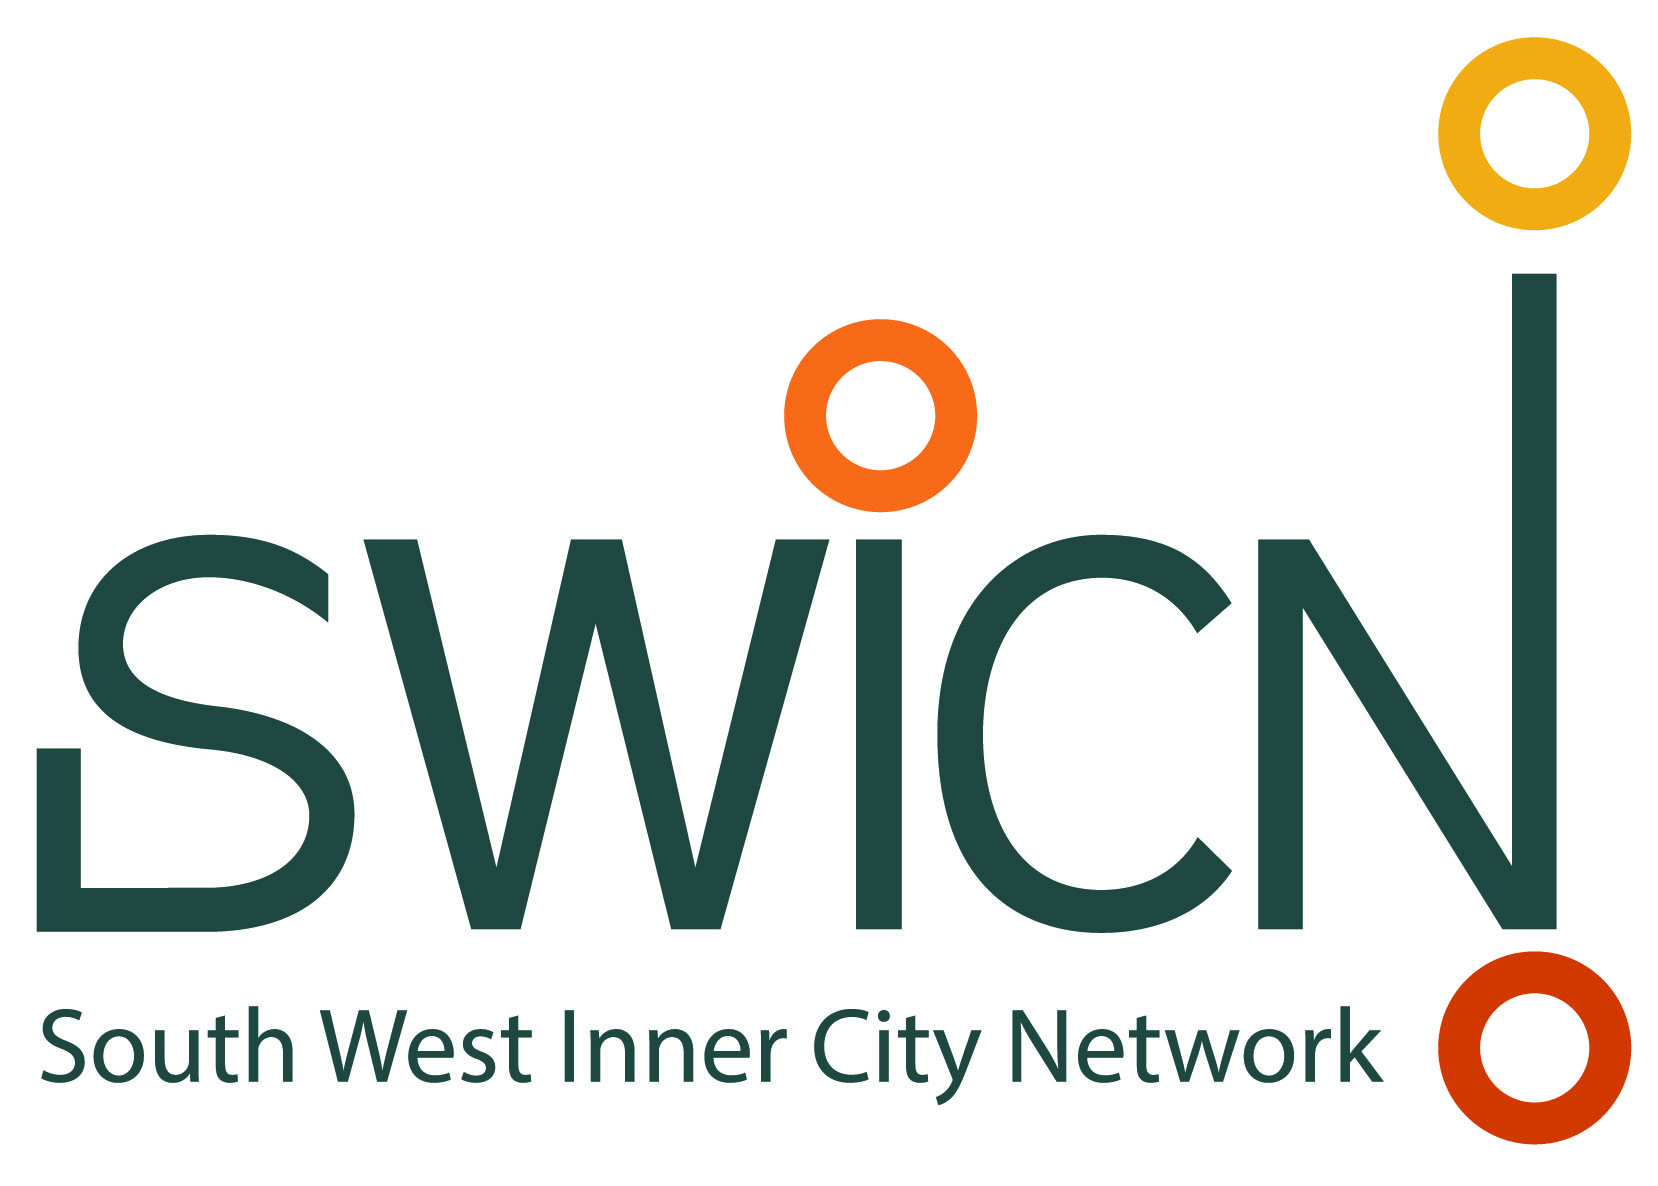 SWICN